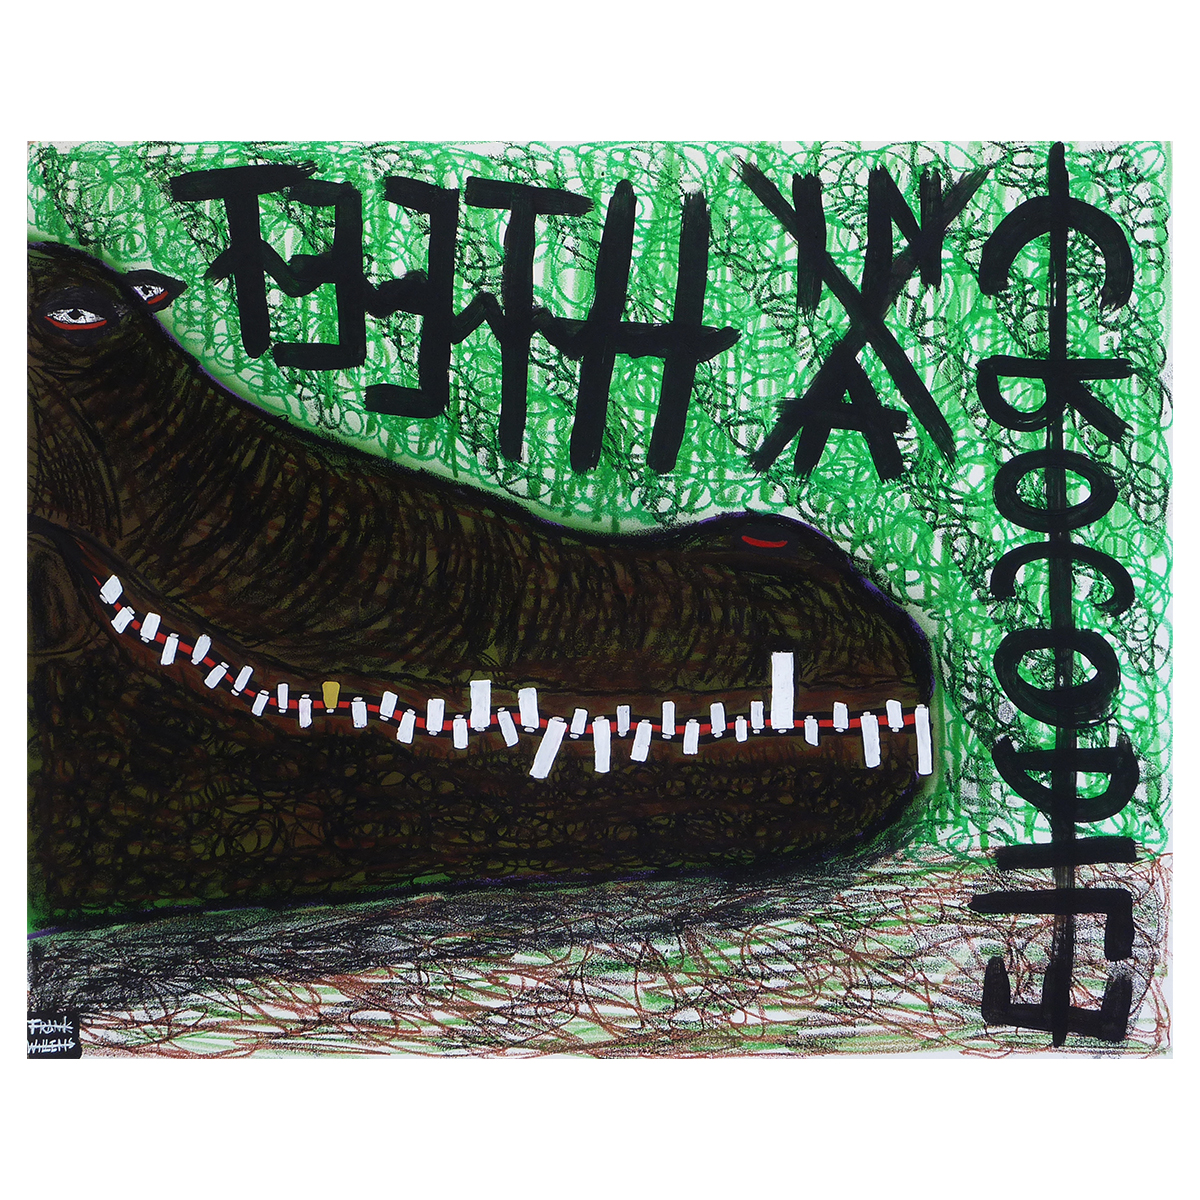 TEETH IN A CROCODILE - Frank Willems